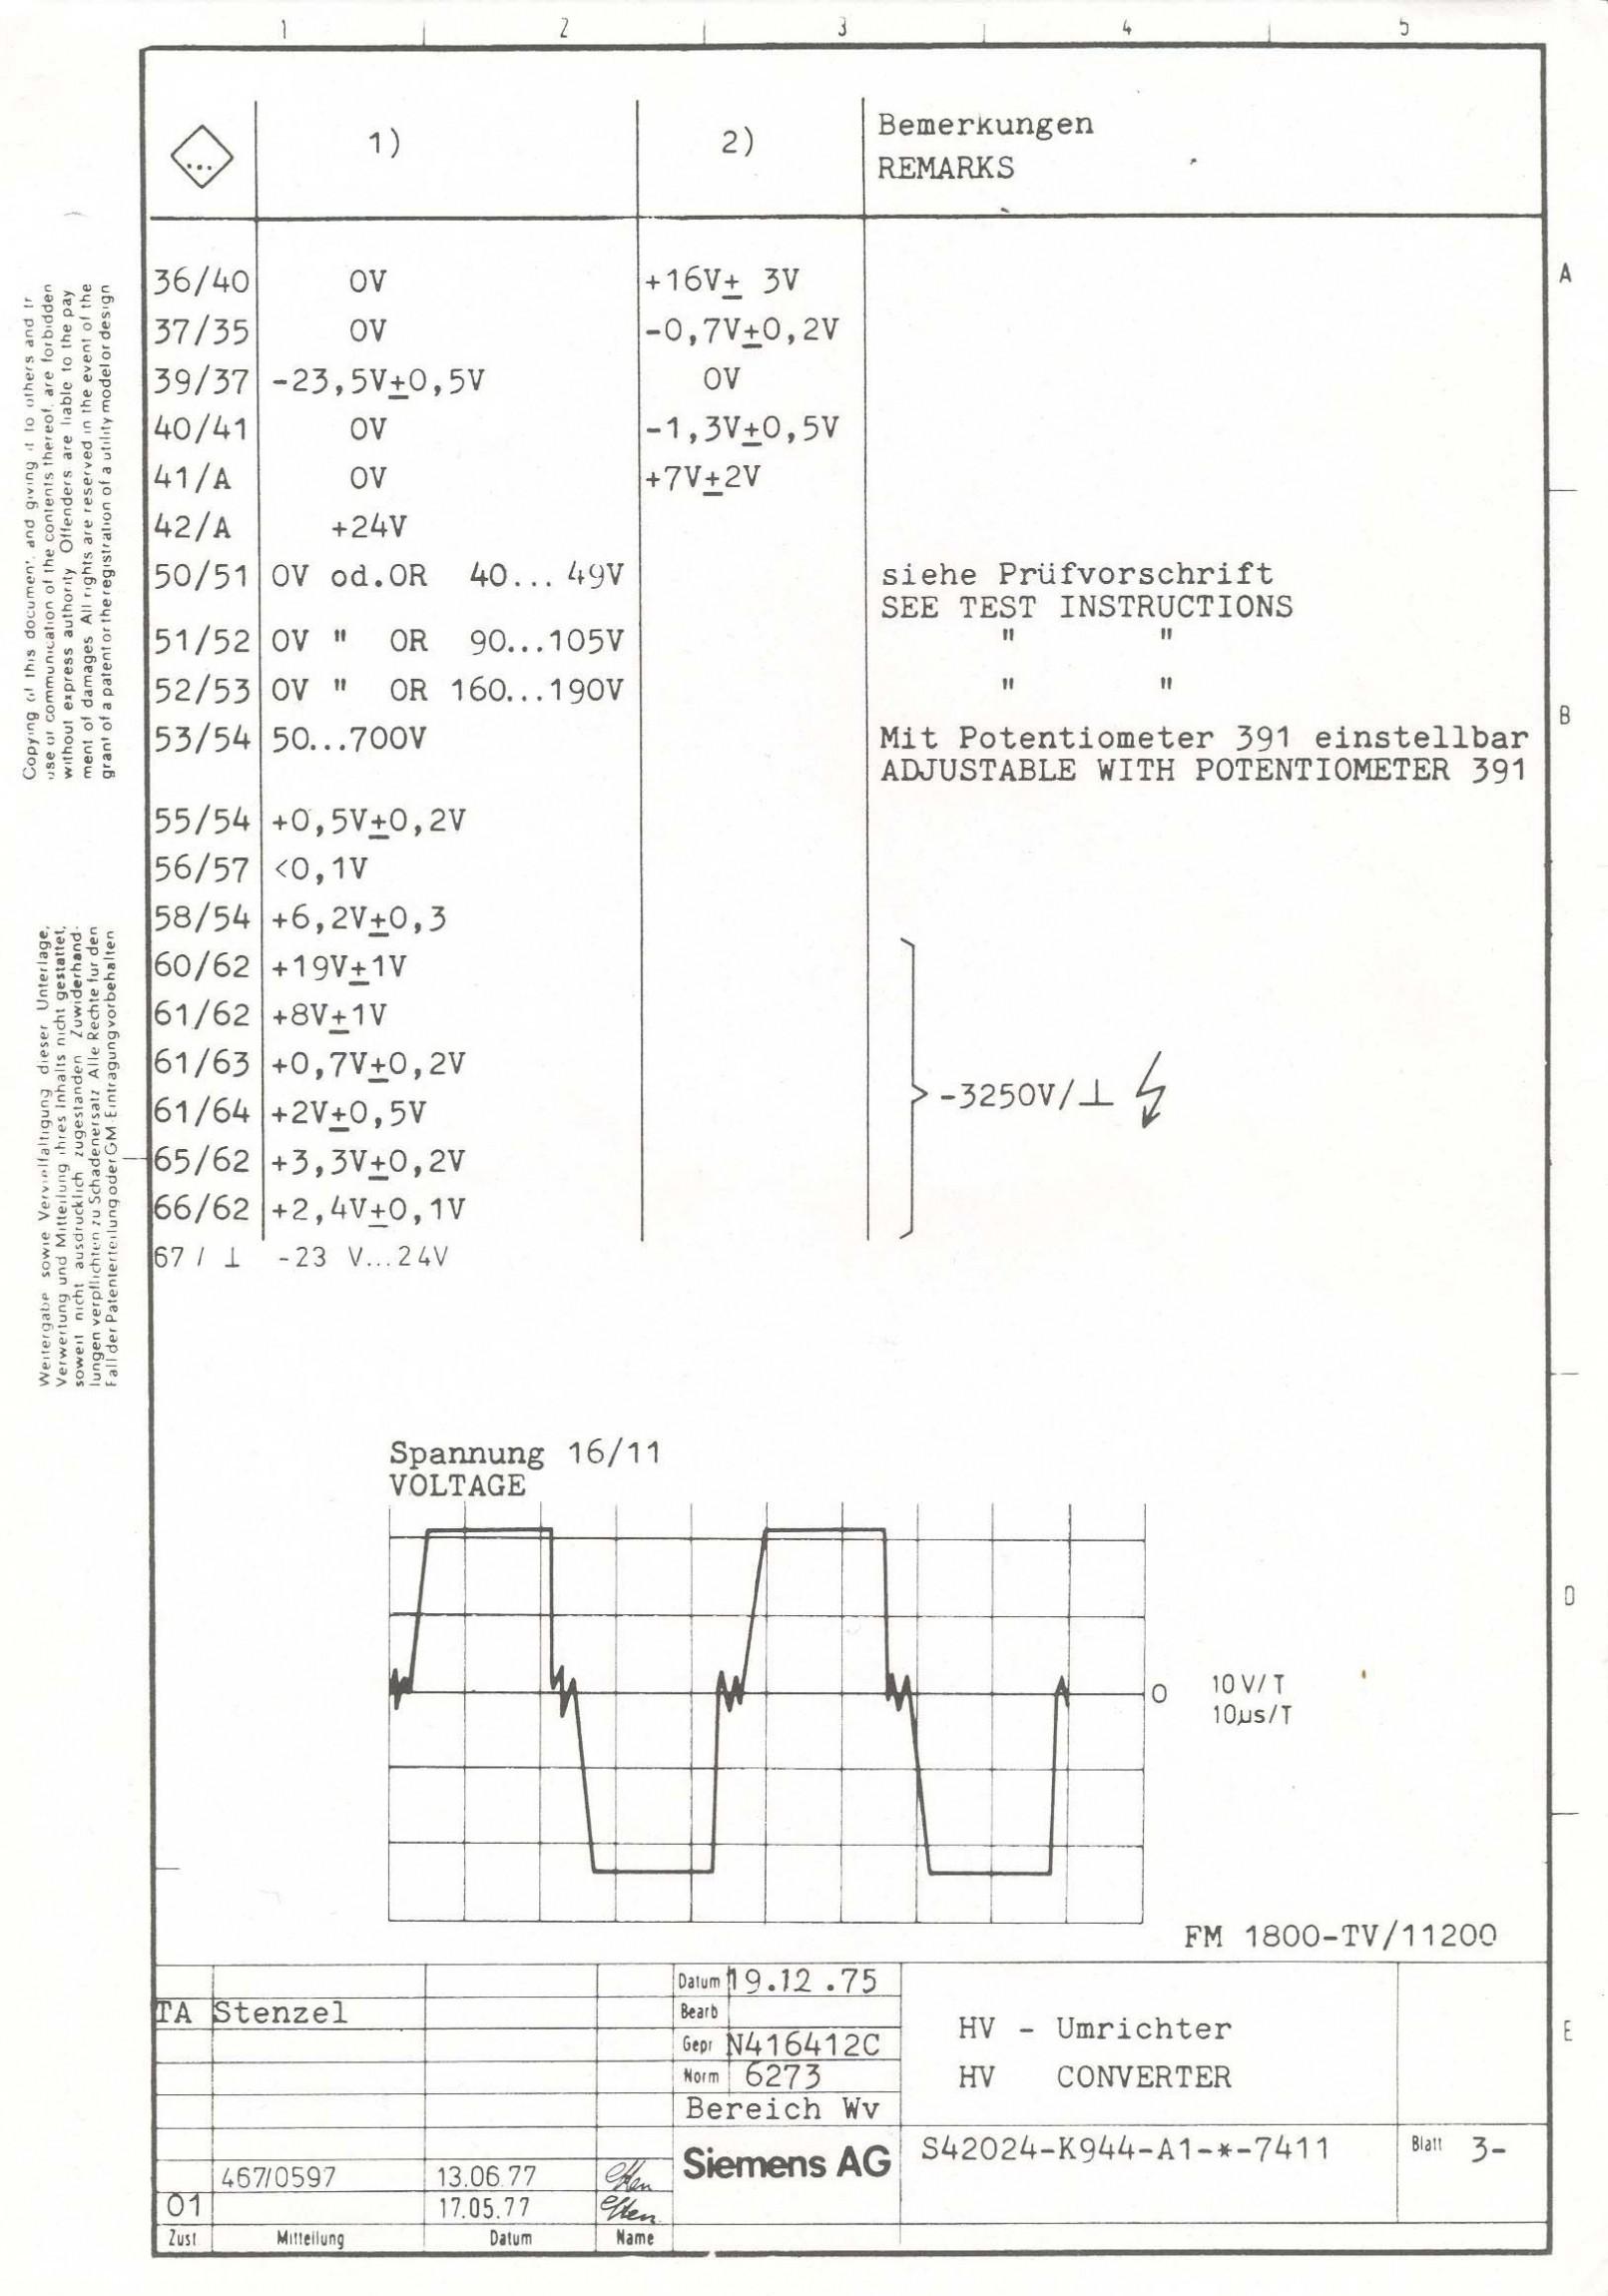 Rv 50 Amp Wiring Diagram 50 Amp Twist Lock Plug Wiring Diagram Rate 4 Prong Generator Plug Of Rv 50 Amp Wiring Diagram